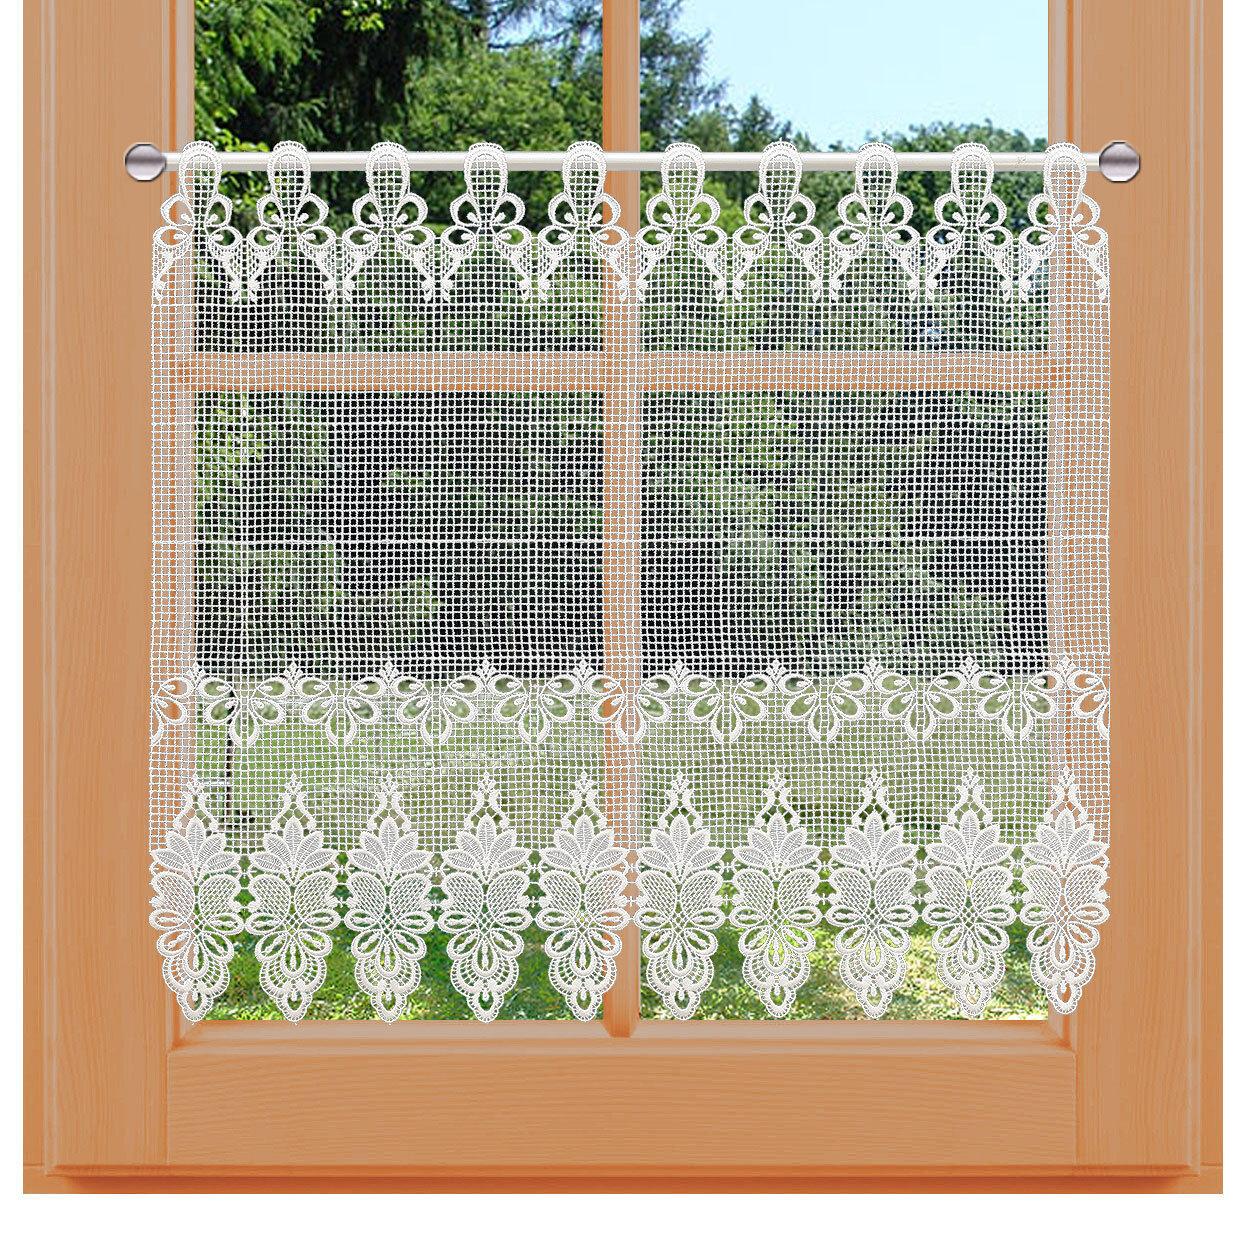 Flächen-Luftspitzengardine Farisa Farisa Farisa Plauener Spitze exklusiv bei kollektion.MT | Professionelles Design  | Perfekt In Verarbeitung  28dffa